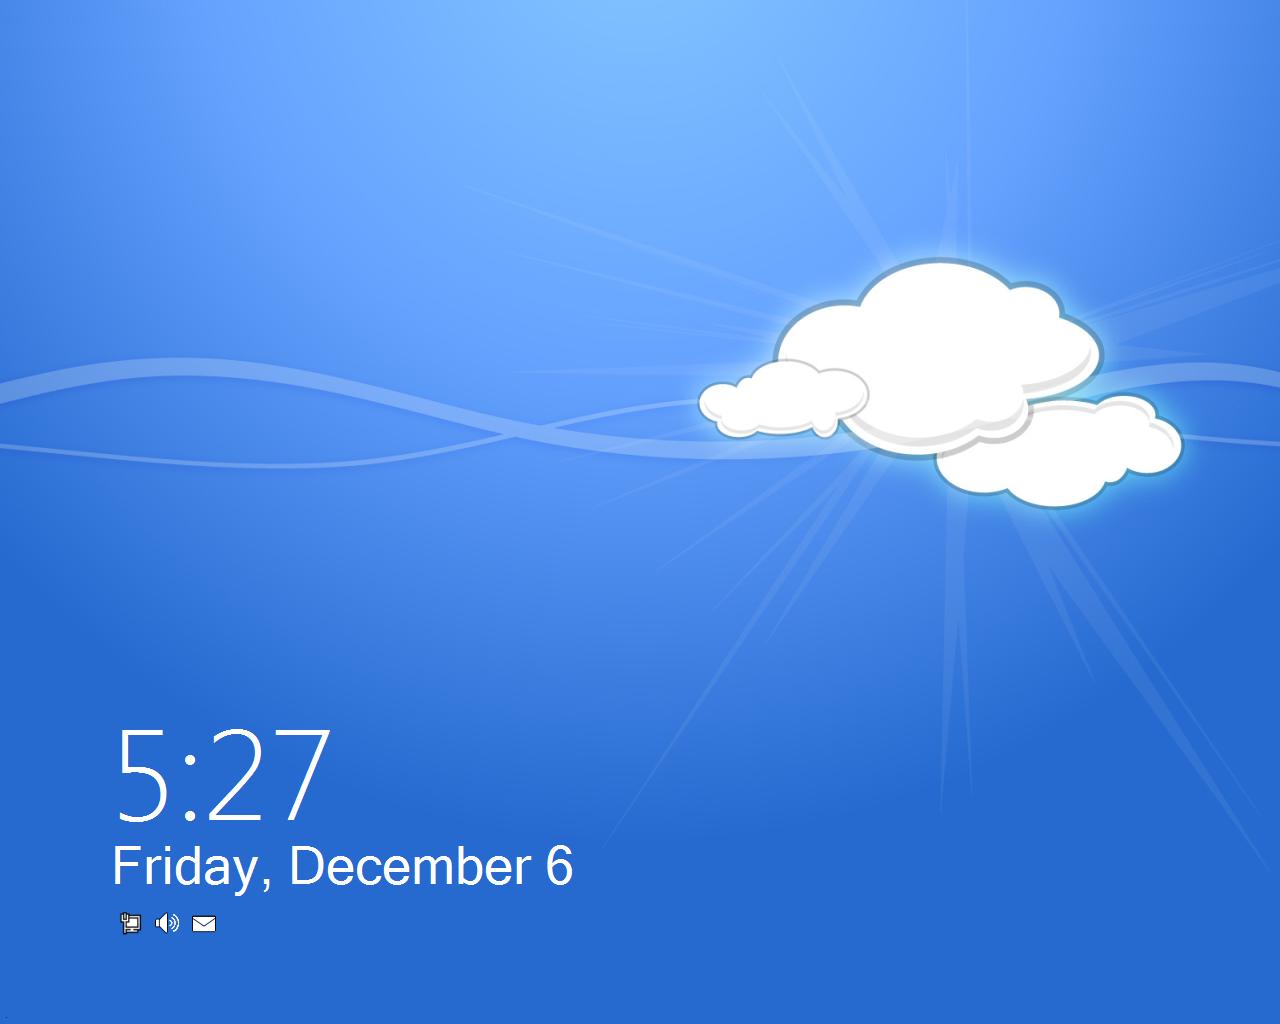 Add a Second Lock Screen to Windows 7 1280x1024